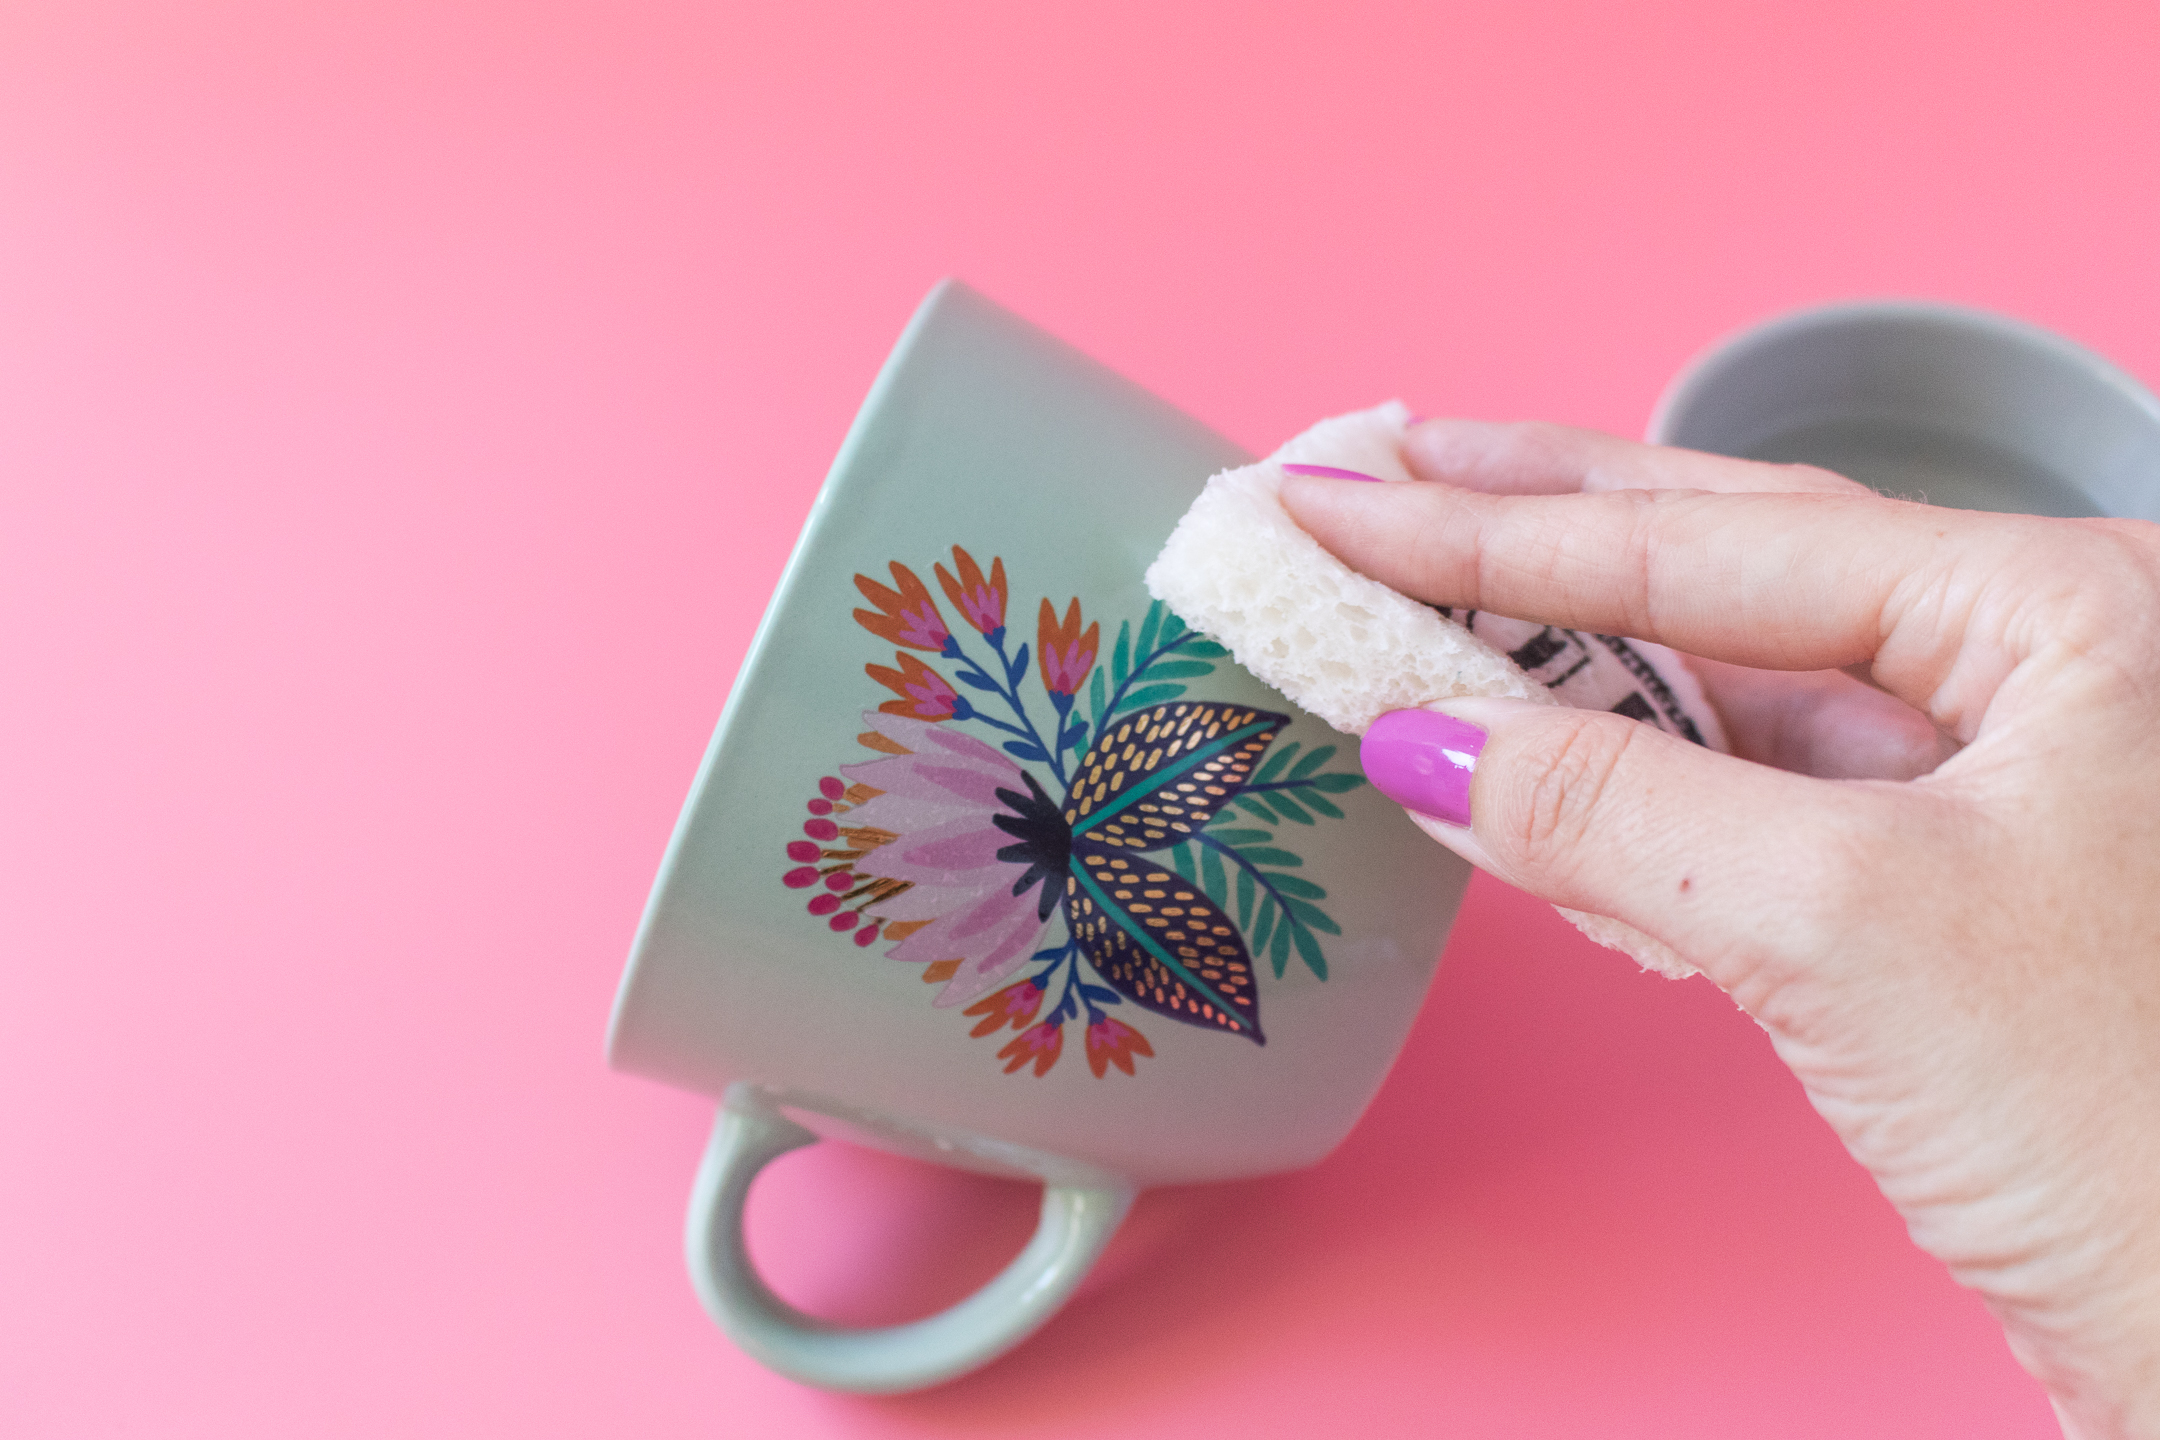 Photo of sponge applying a temporary tattoo to ceramics.